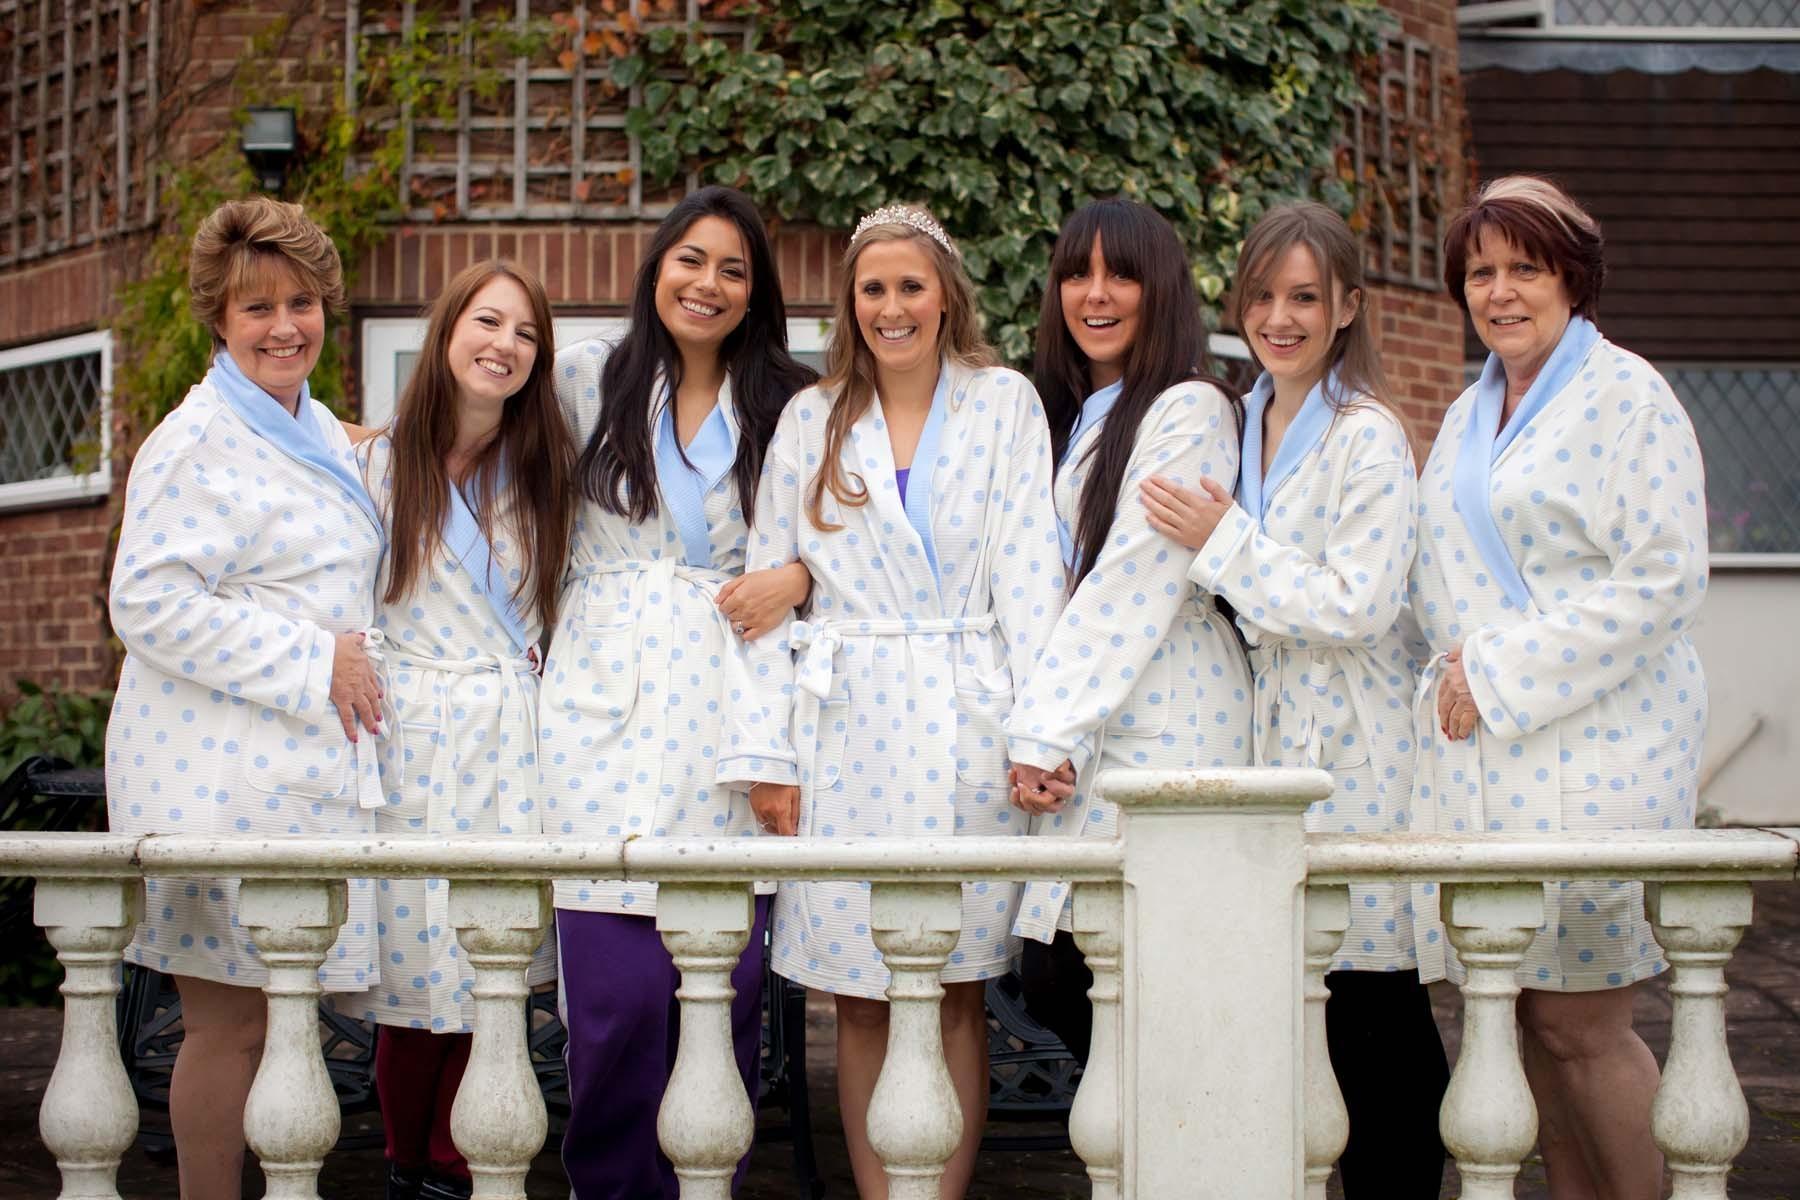 Sussex & Surrey Wedding Photographer - Guests & Groups (15)